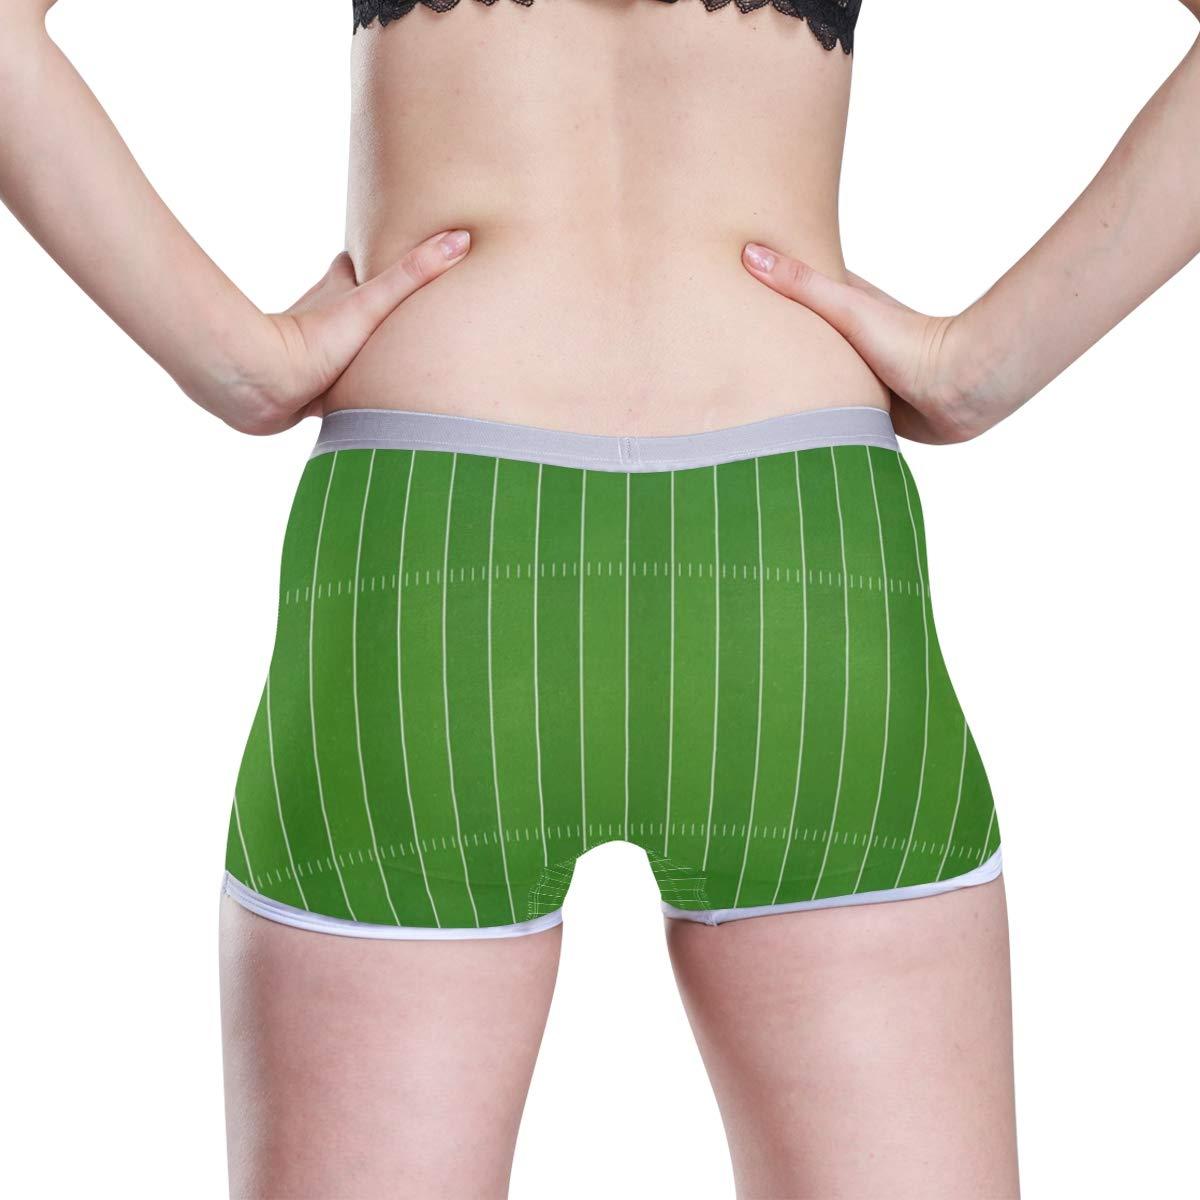 HangWang American Football Field Boyshort Panties Womens Breathable Boyshort Hipster Panty Underwear